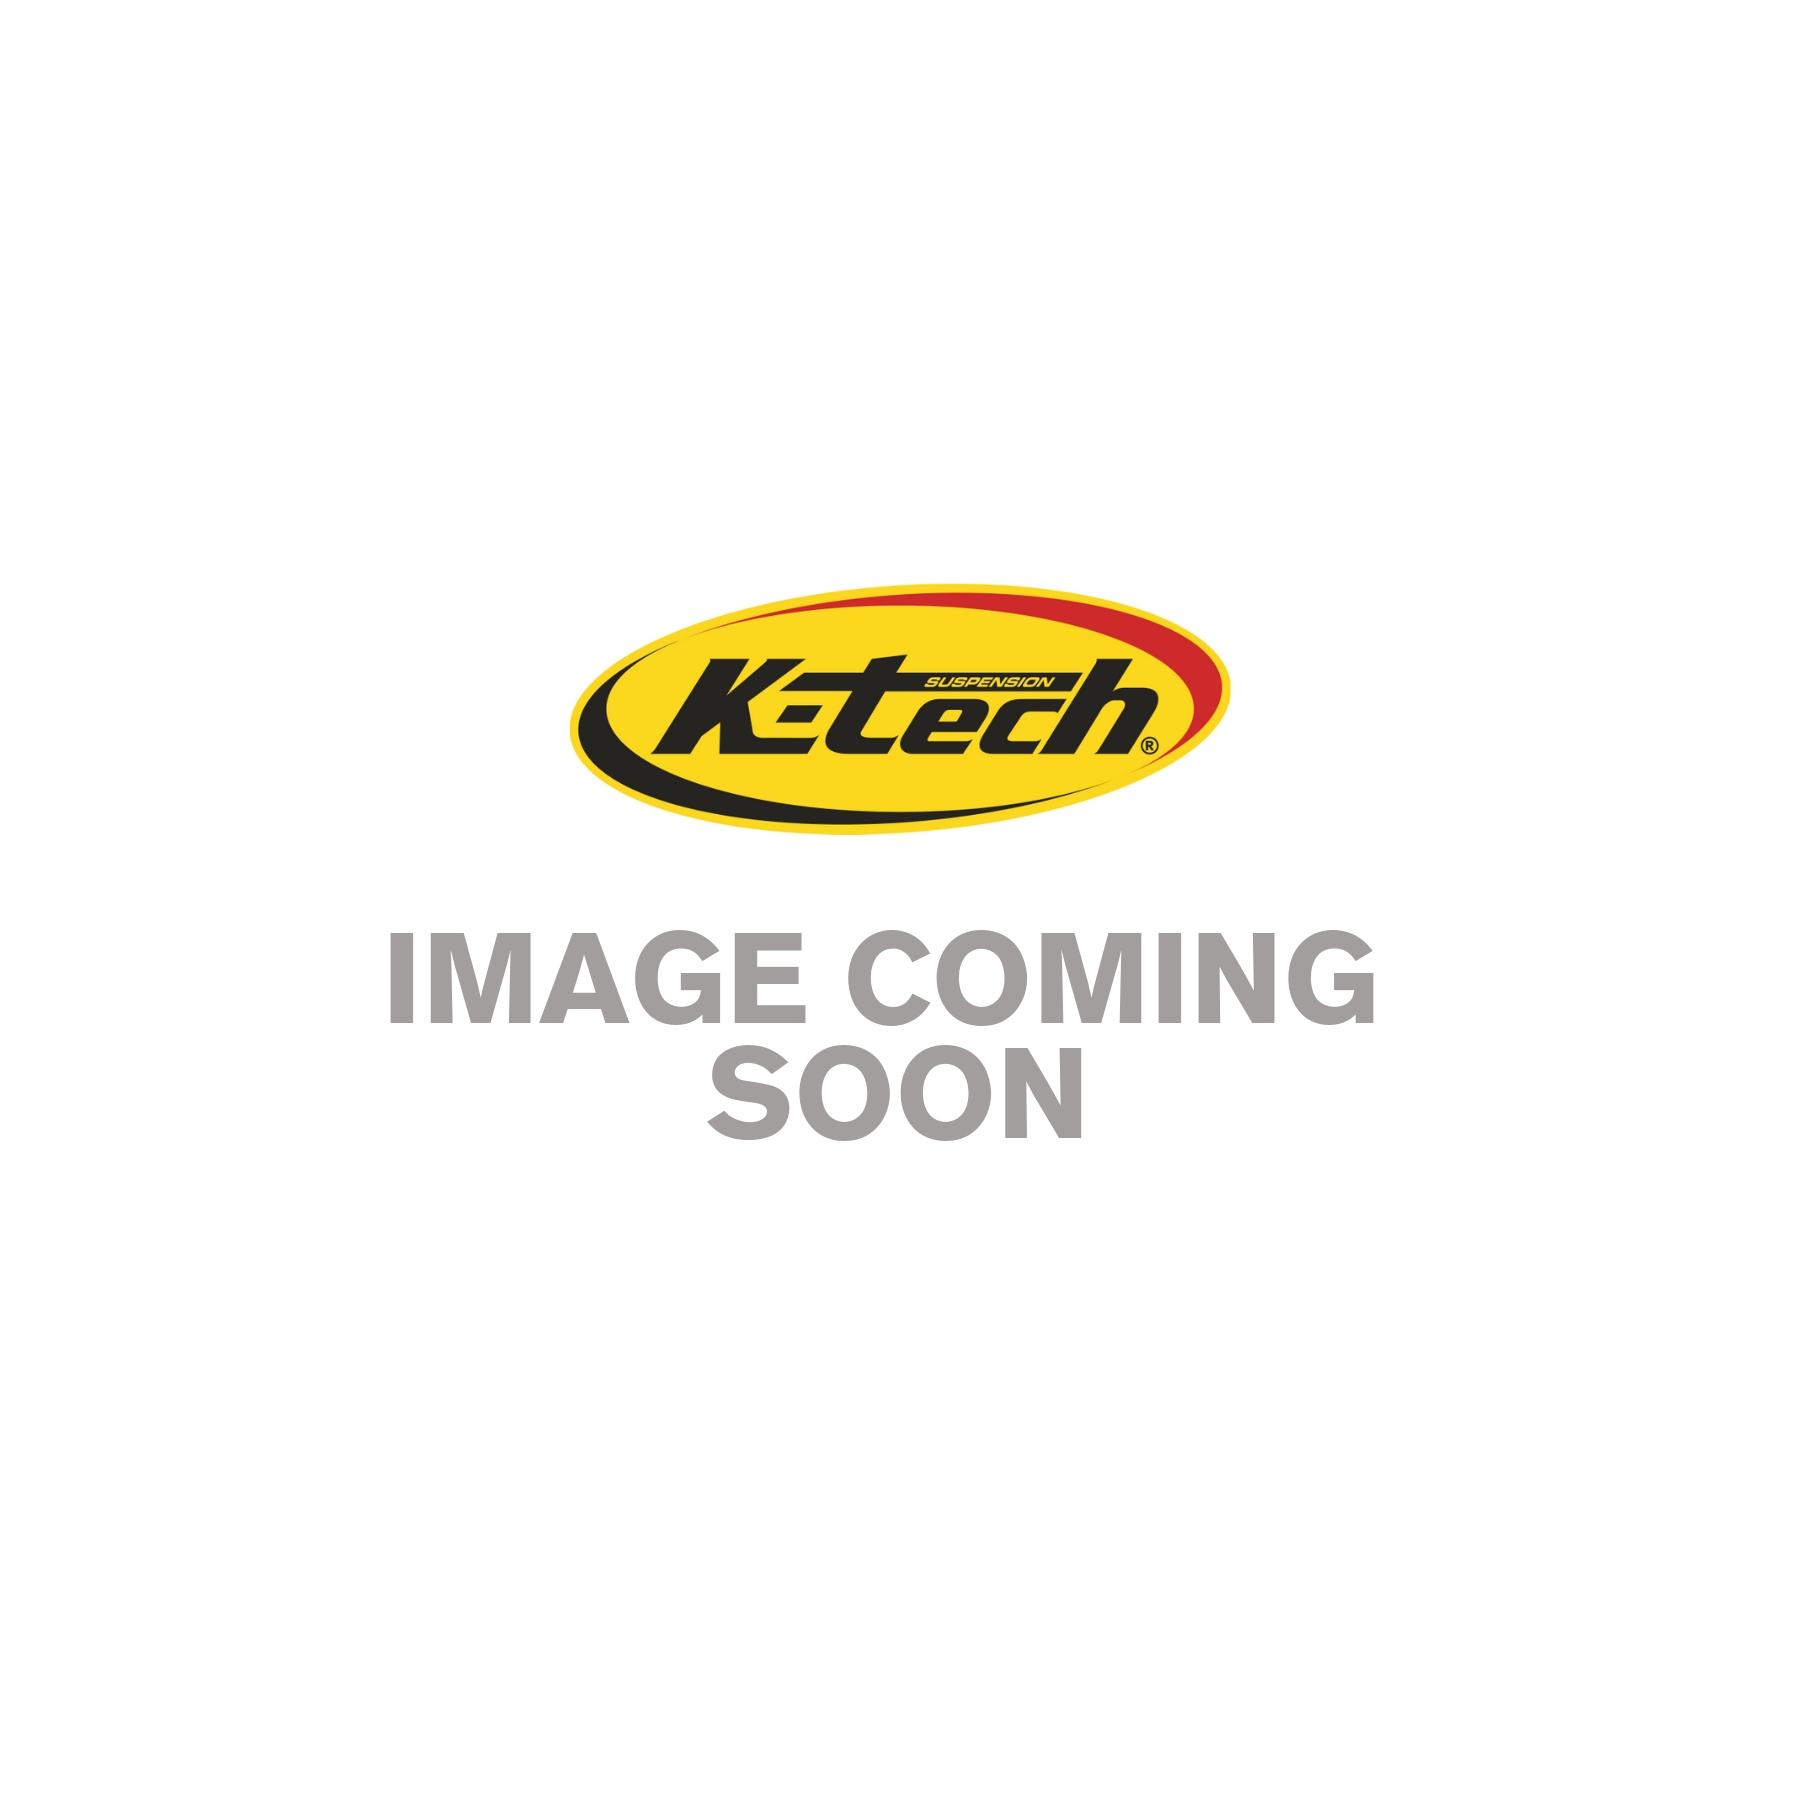 RDS Front Fork Cartridges Triumph Street Triple-R 2008-2012 KYB